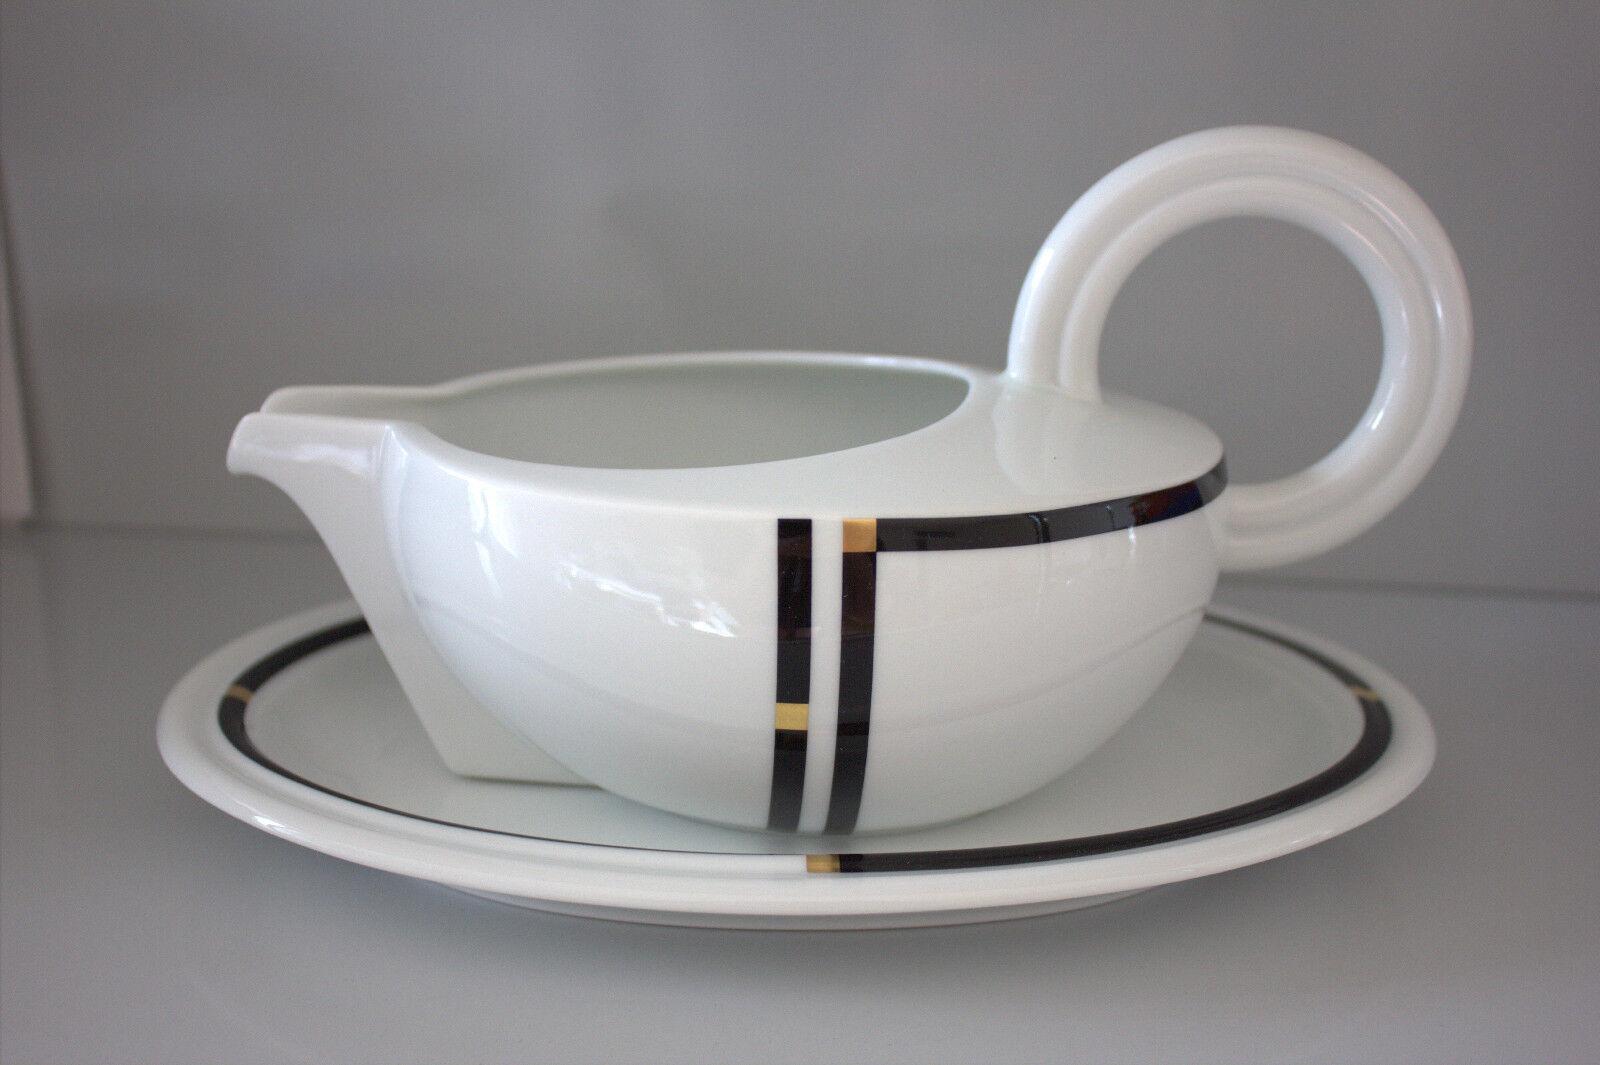 Rosenthal Cupola nera saucière 2tlg I. choix Bellini sauce boat